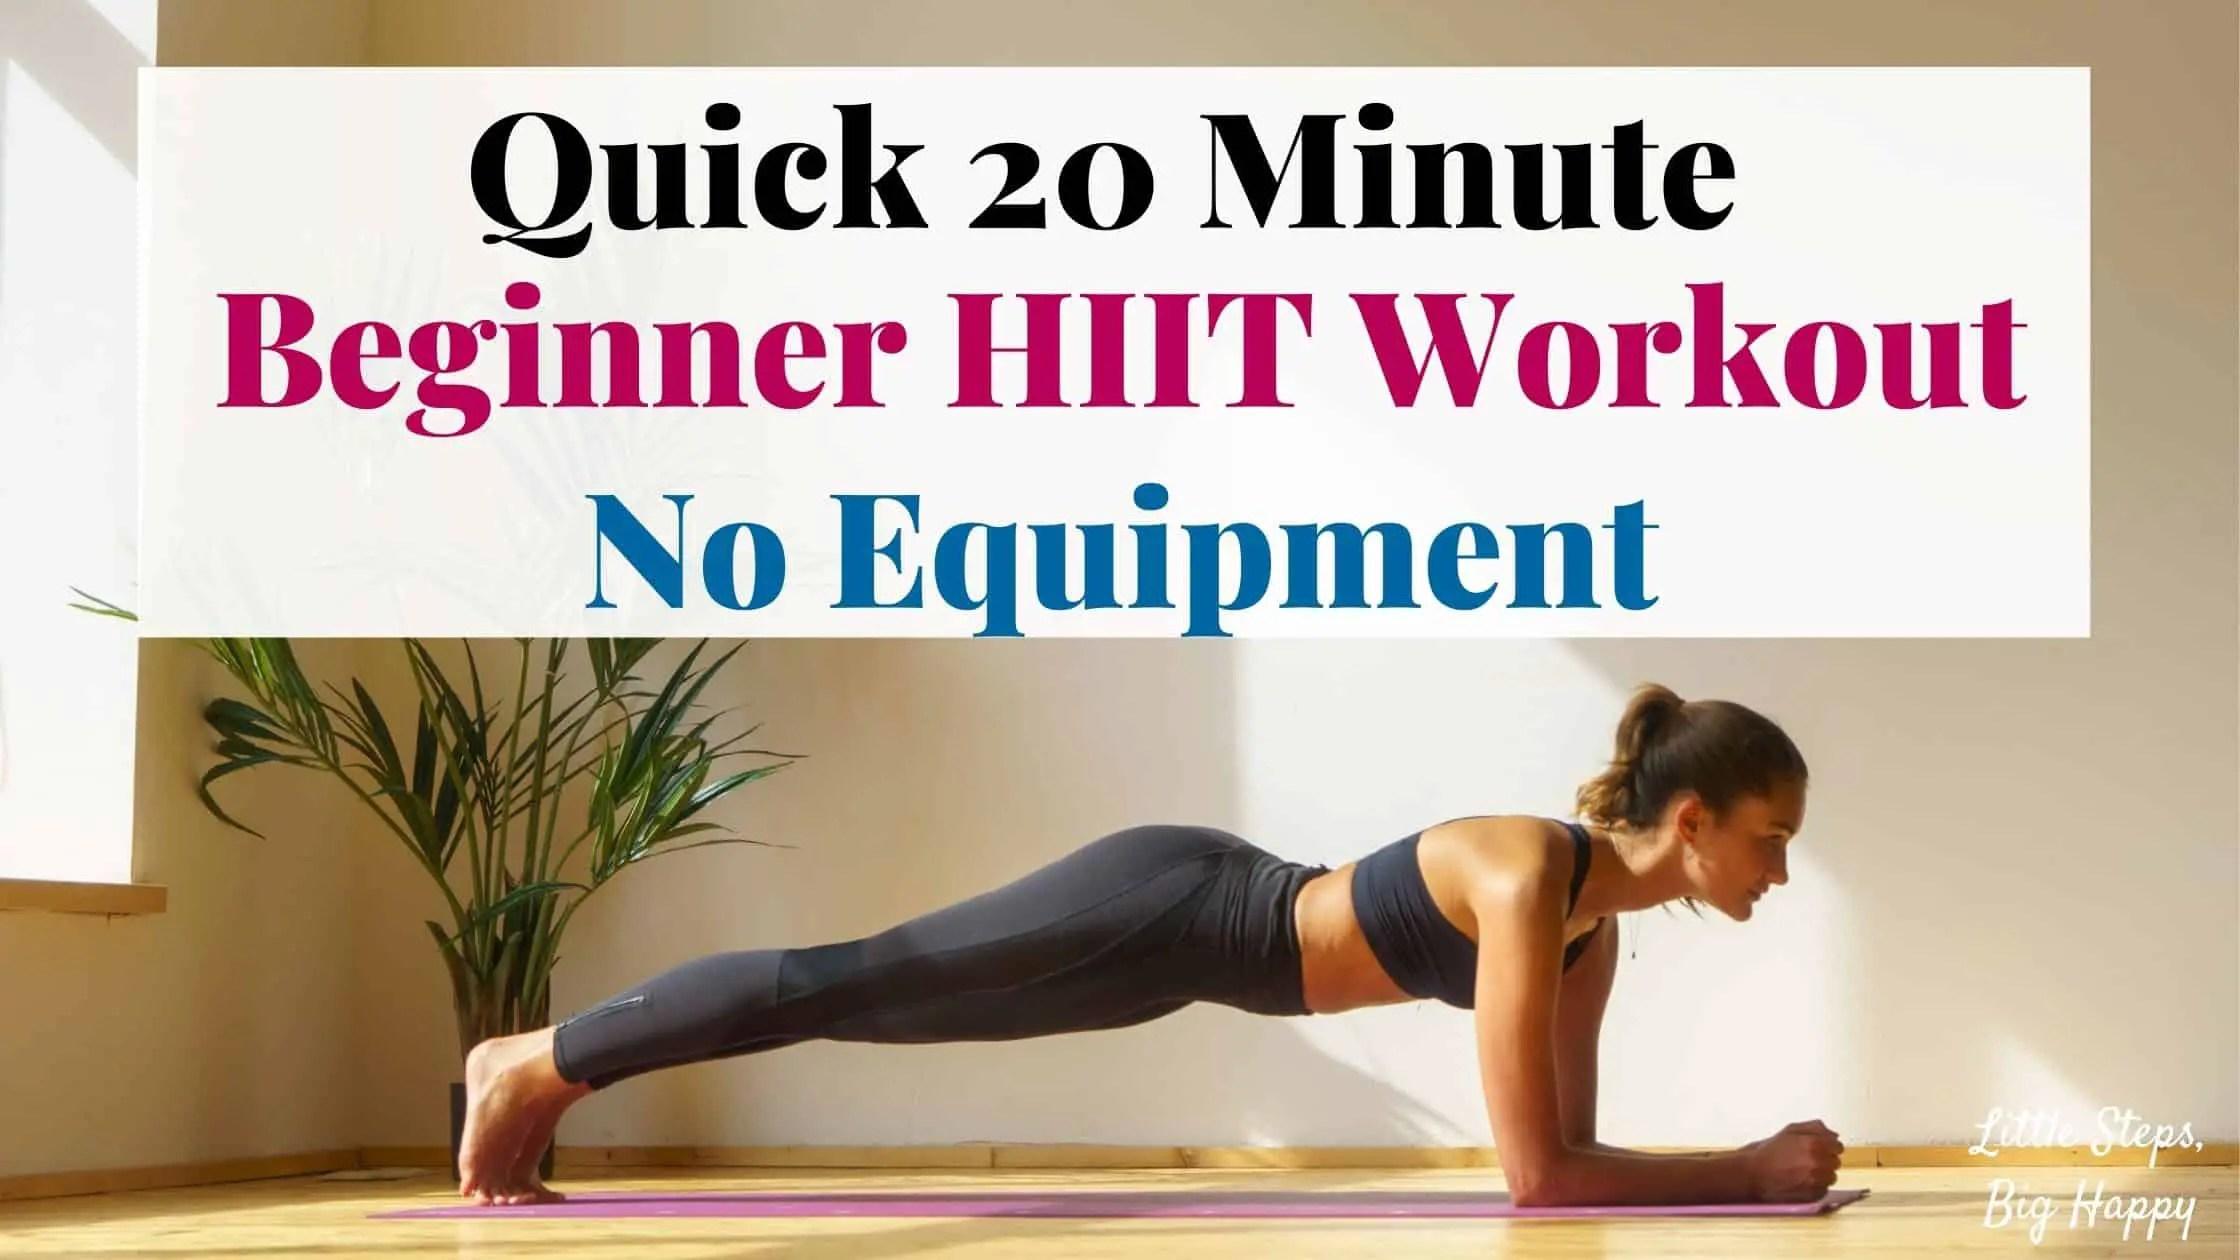 Quick 20 Minute Beginner HIIT Workout - No Equipment